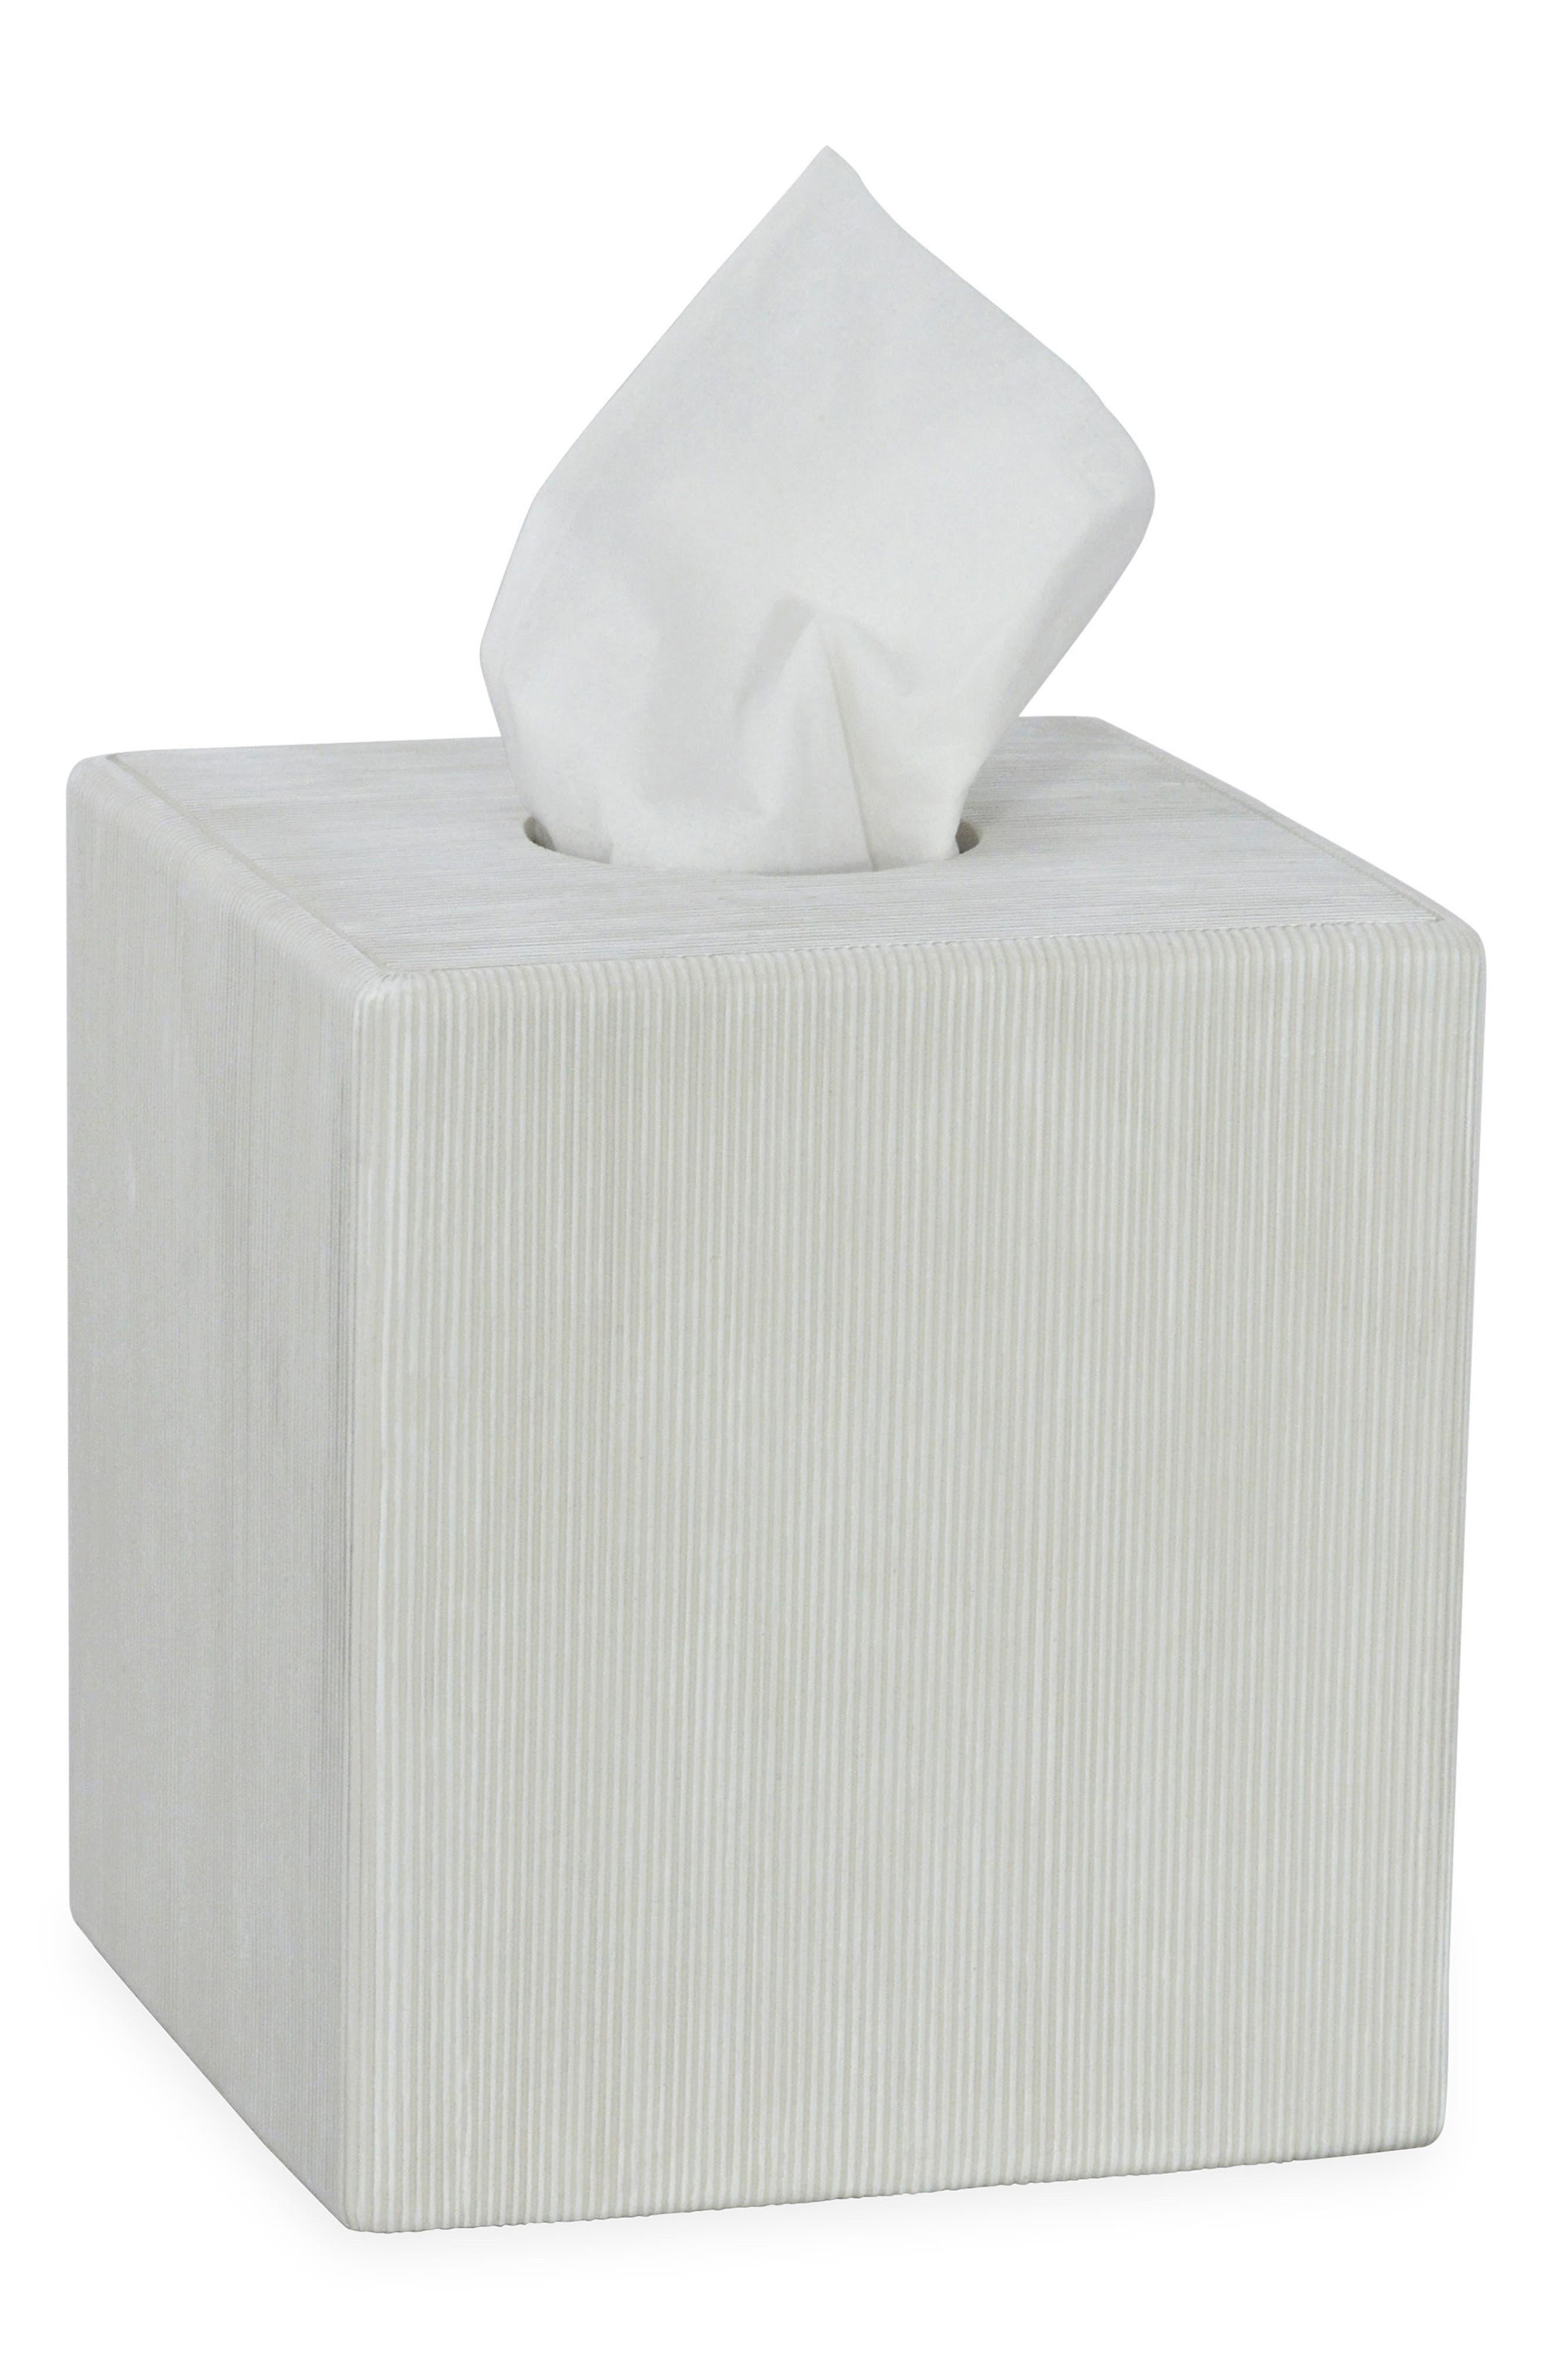 DKNY Fine Lines Ceramic Tissue Box Cover